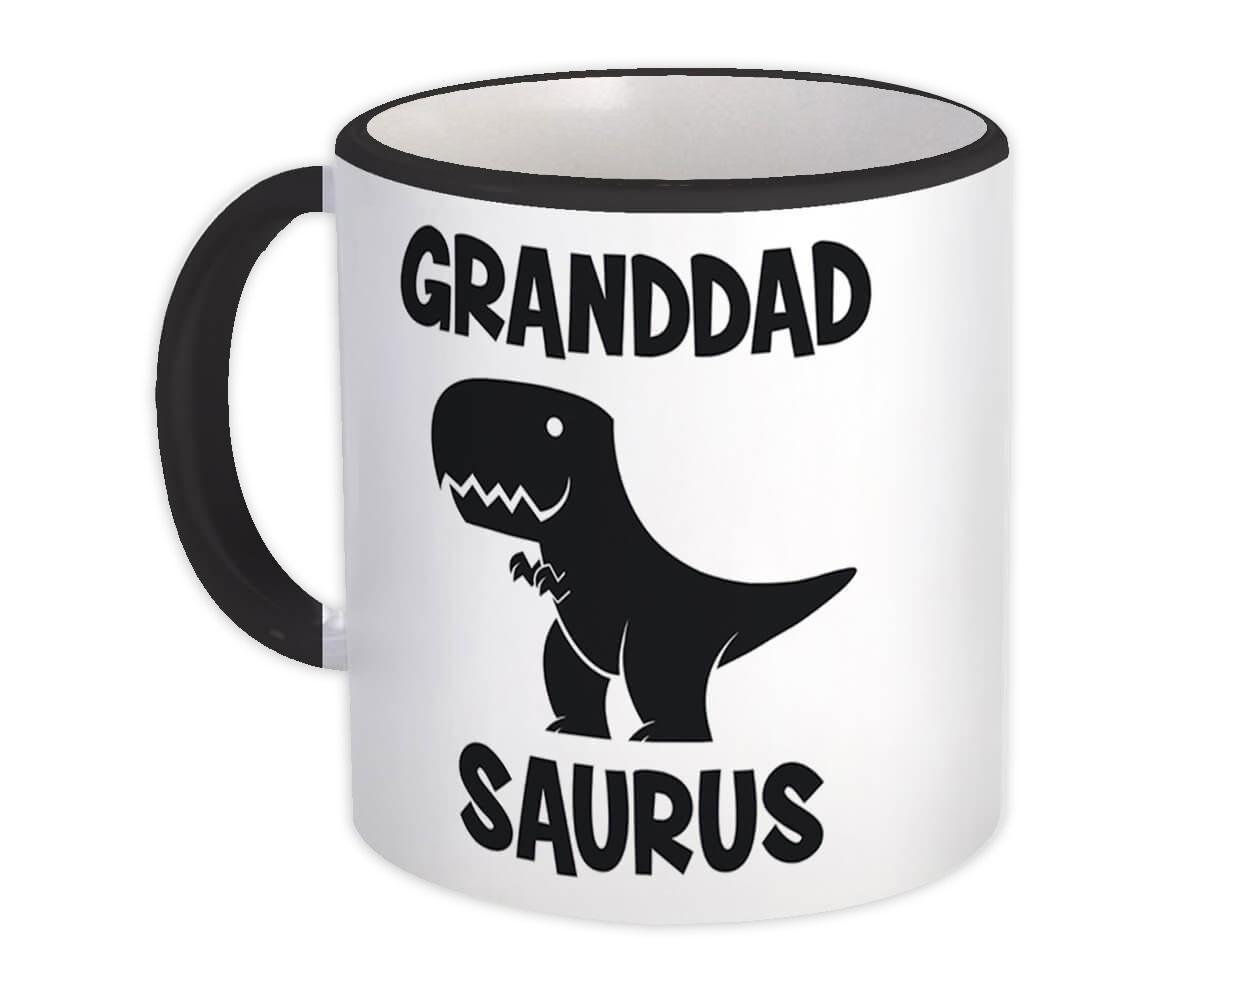 GRANDDAD Saurus : Gift Mug Birthday Dinosaur T Rex cute Family Grandpa